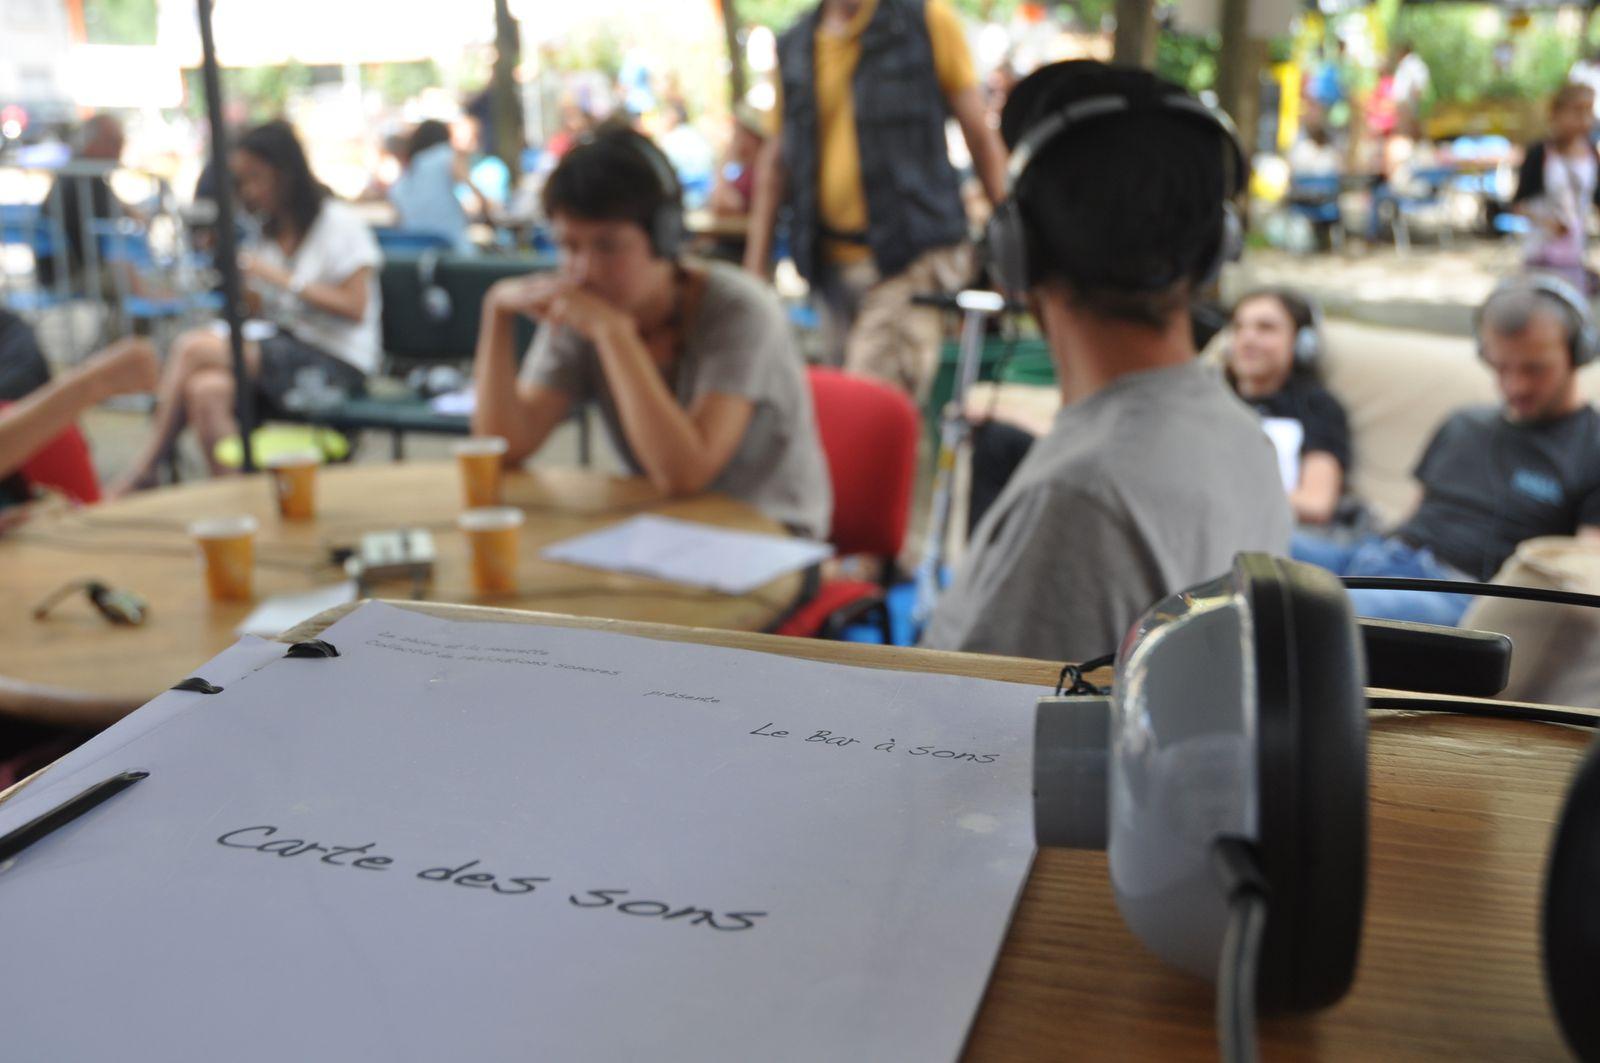 Le bar à sons au festival Maza'grand